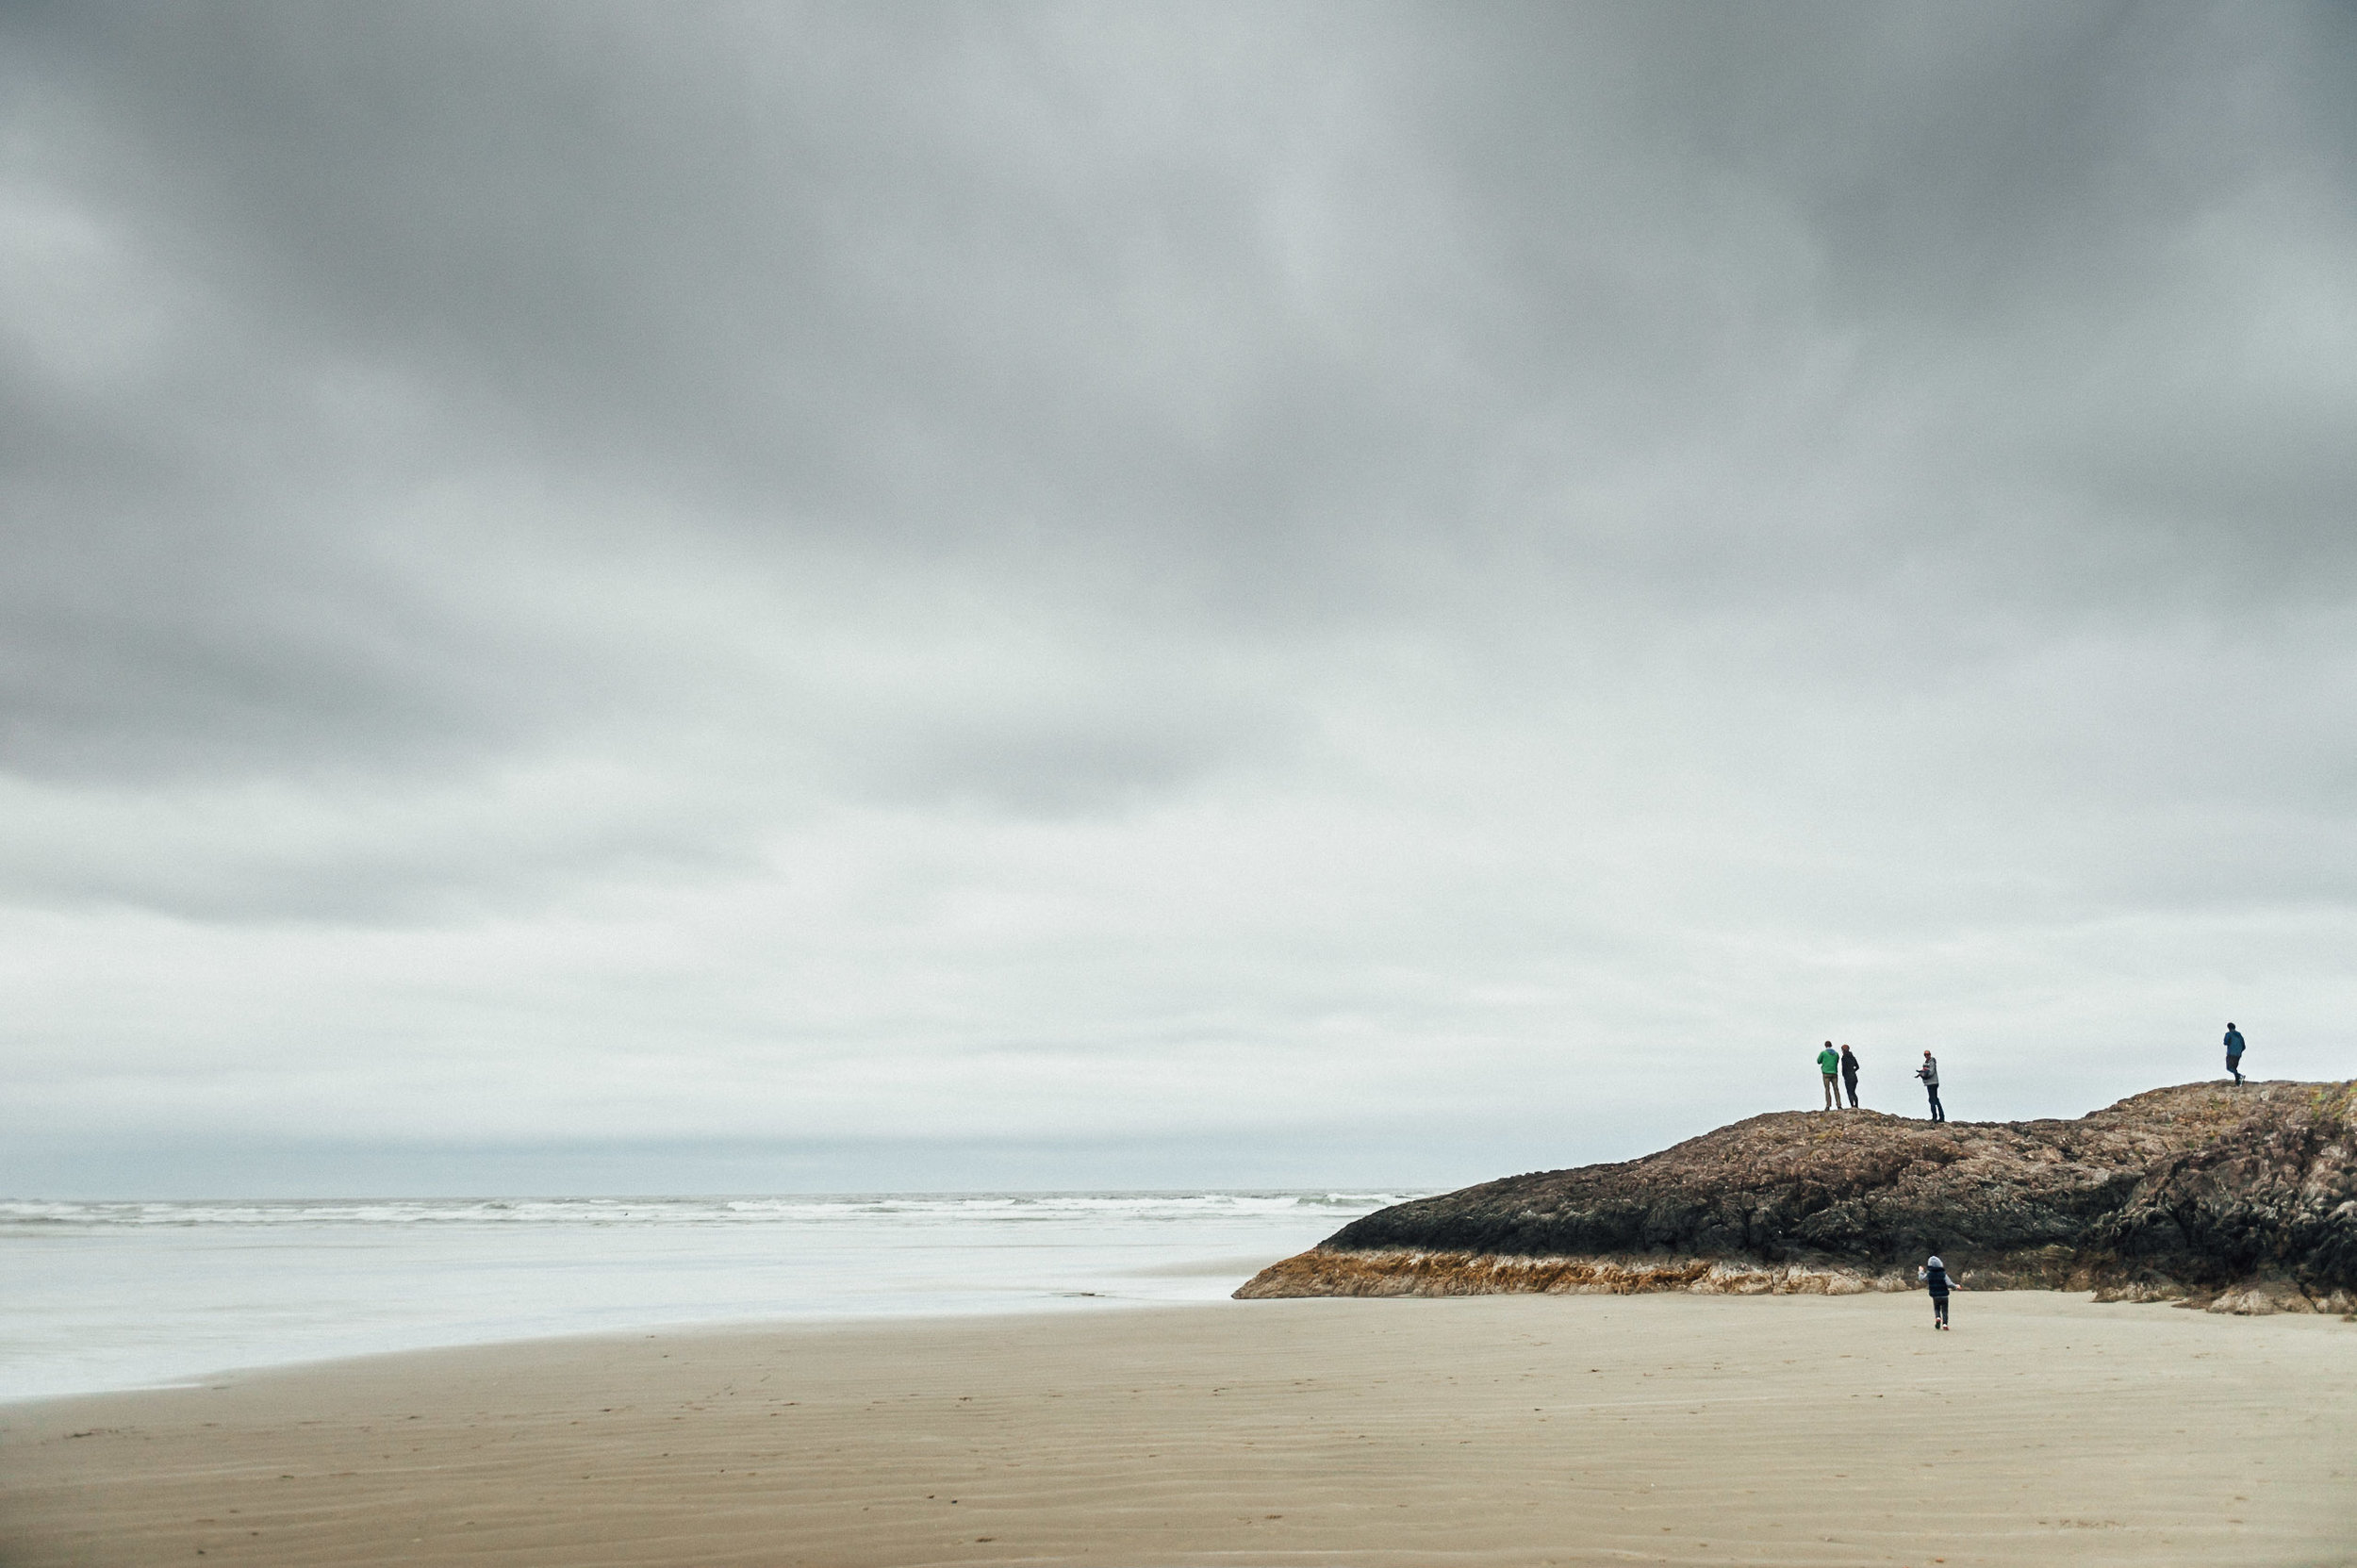 family playing on beach - niagara lifestyle family photographer